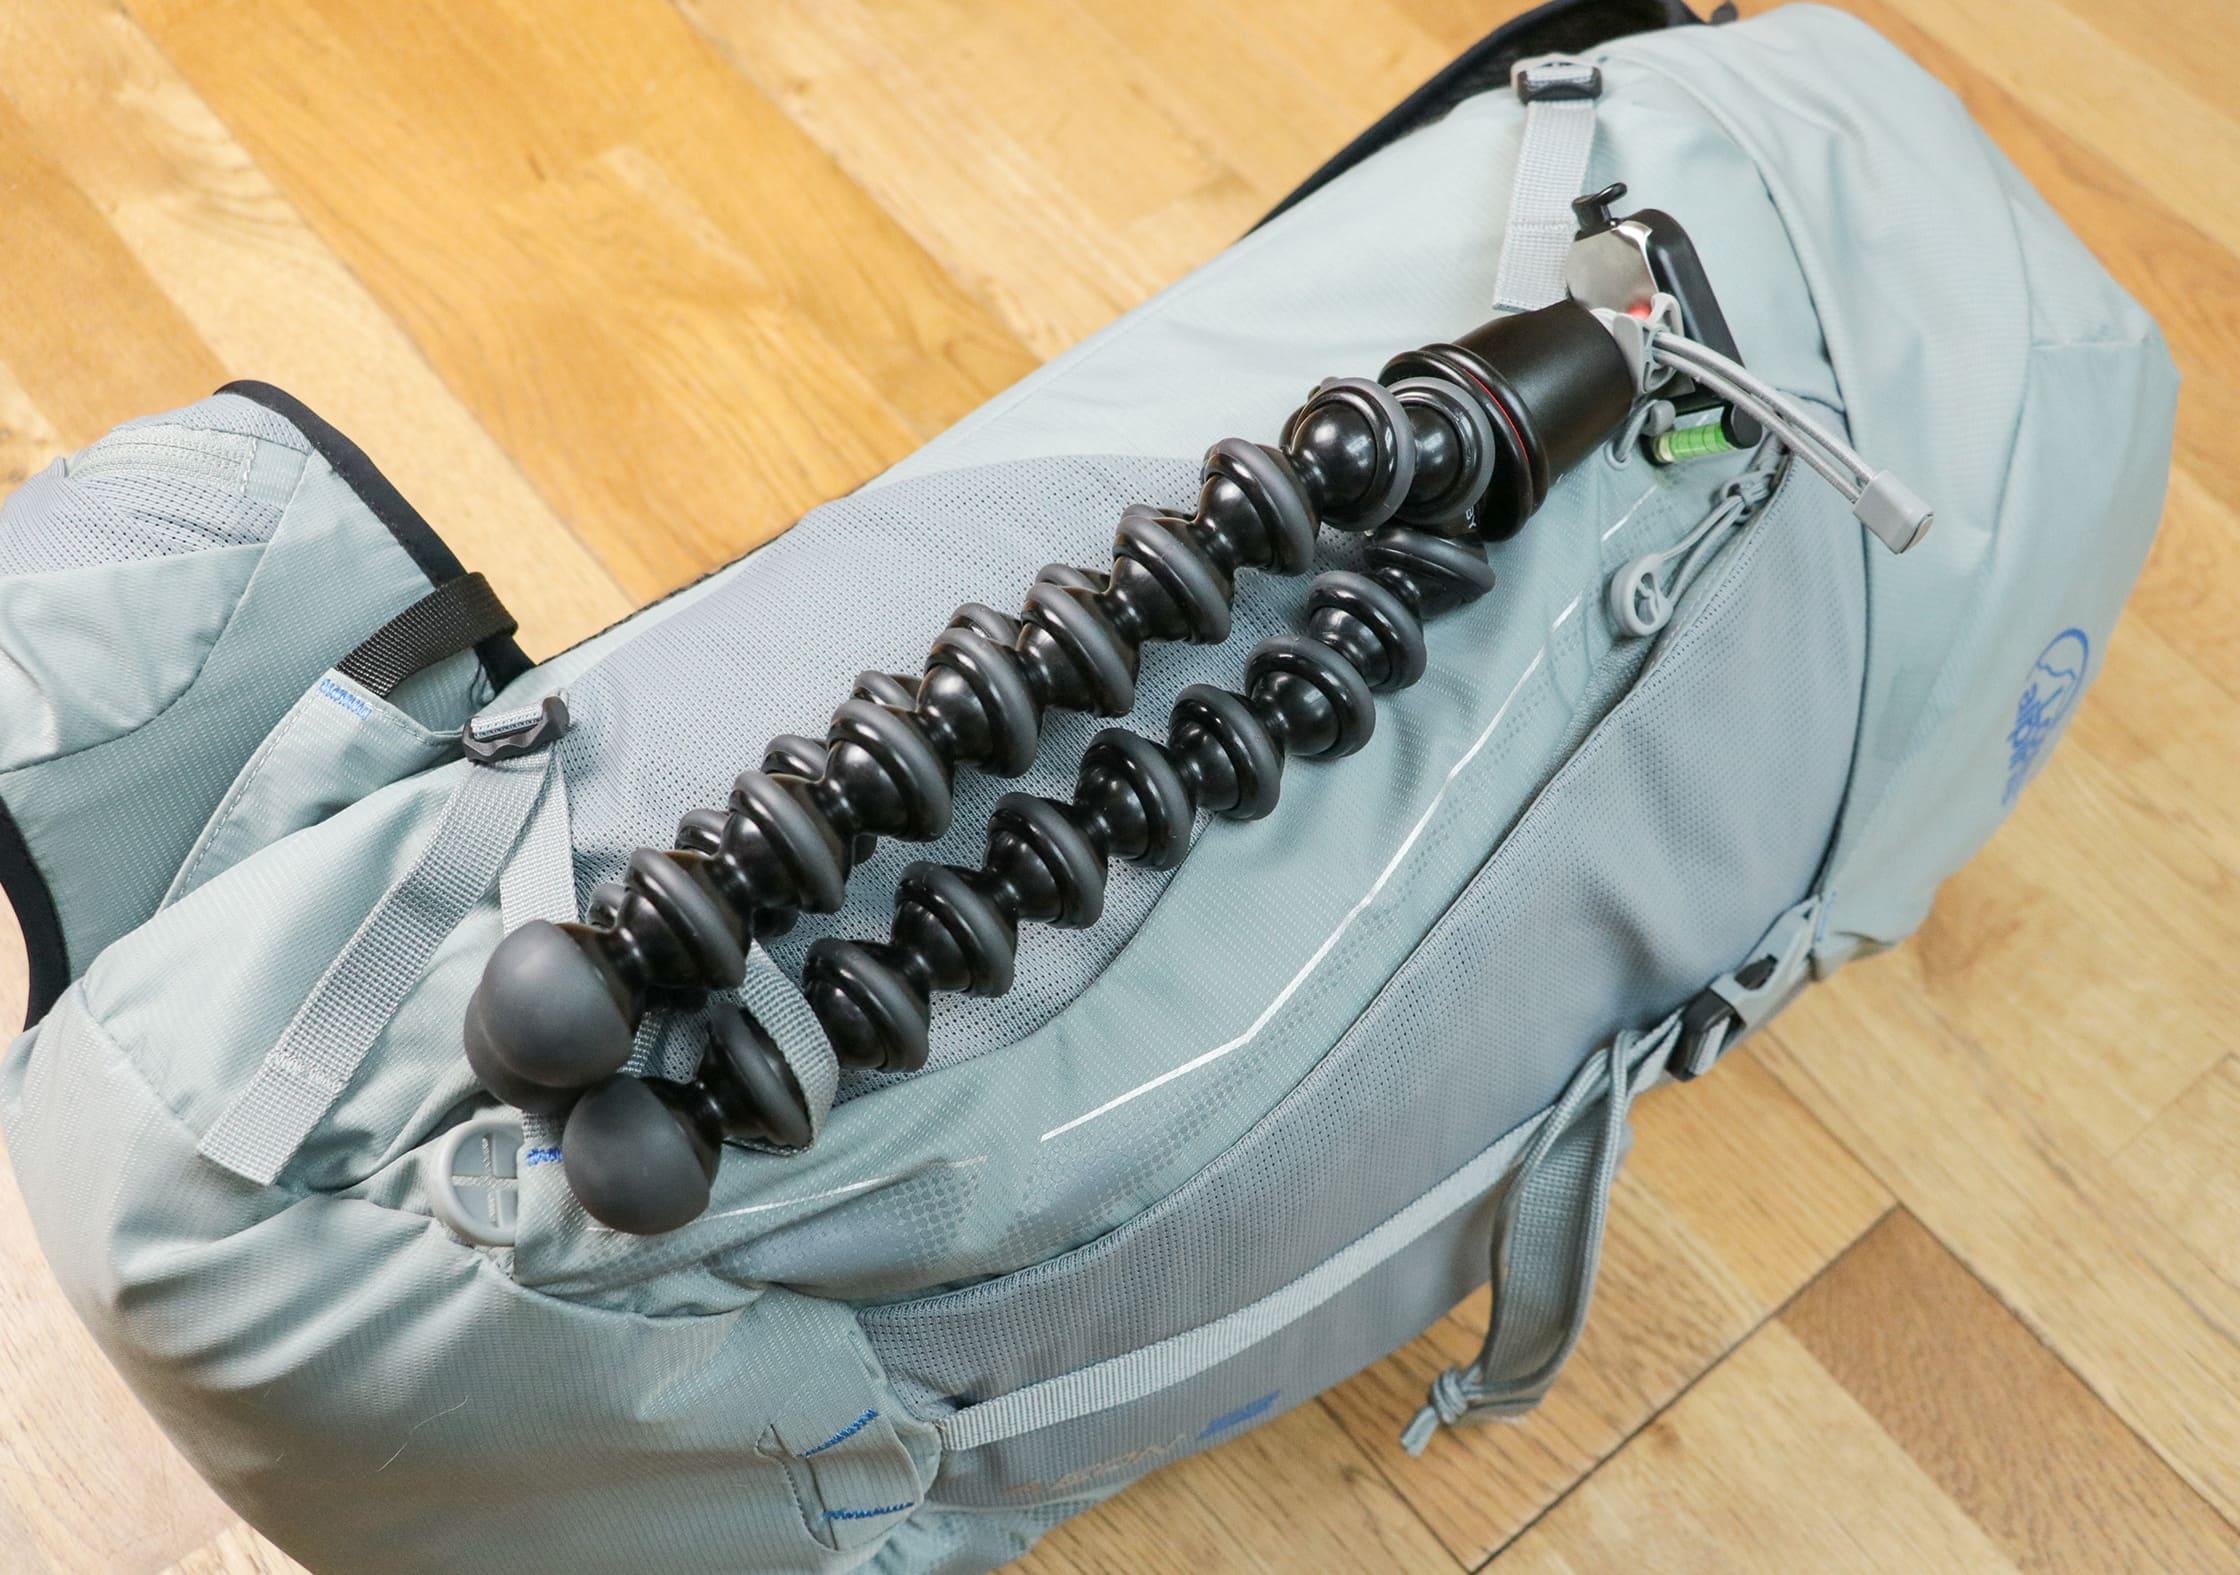 JOBY GorillaPod 3K Attached To The Lowe Alpine Aeon Using The Multi-Lock Tool™